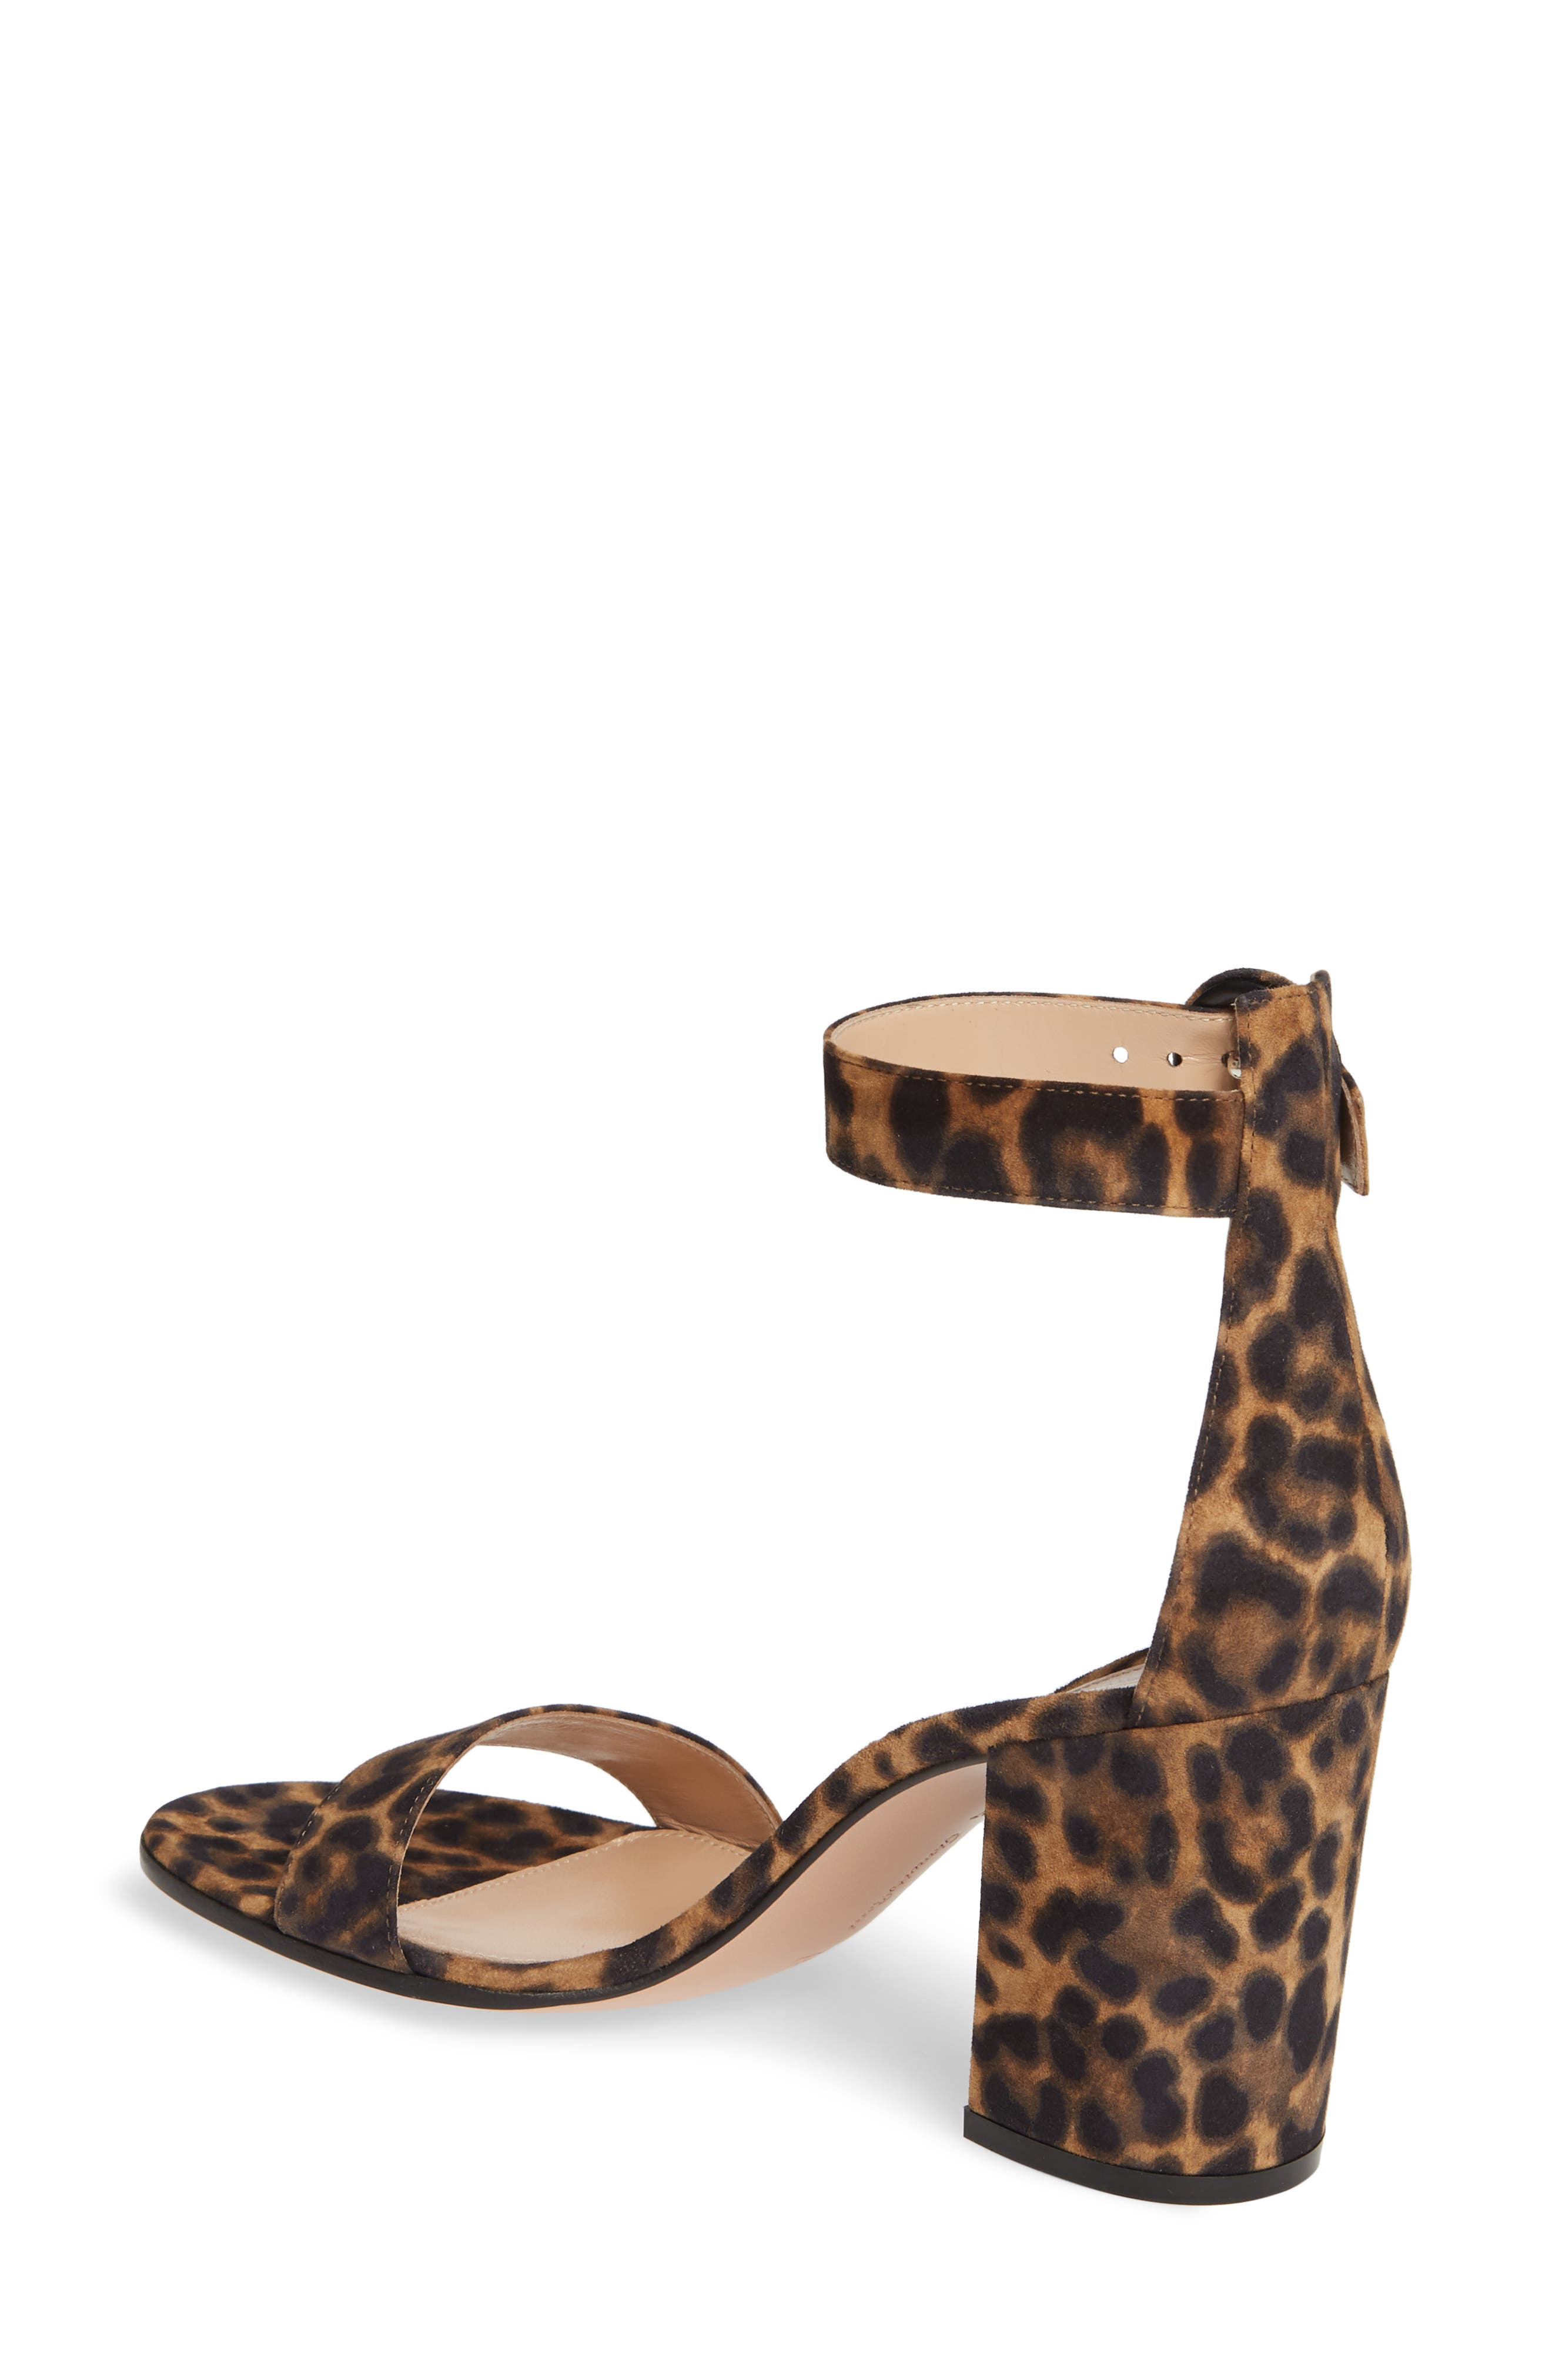 GIANVITO ROSSI, Leopard Print Ankle Strap Sandal, Alternate thumbnail 2, color, LEOPARD